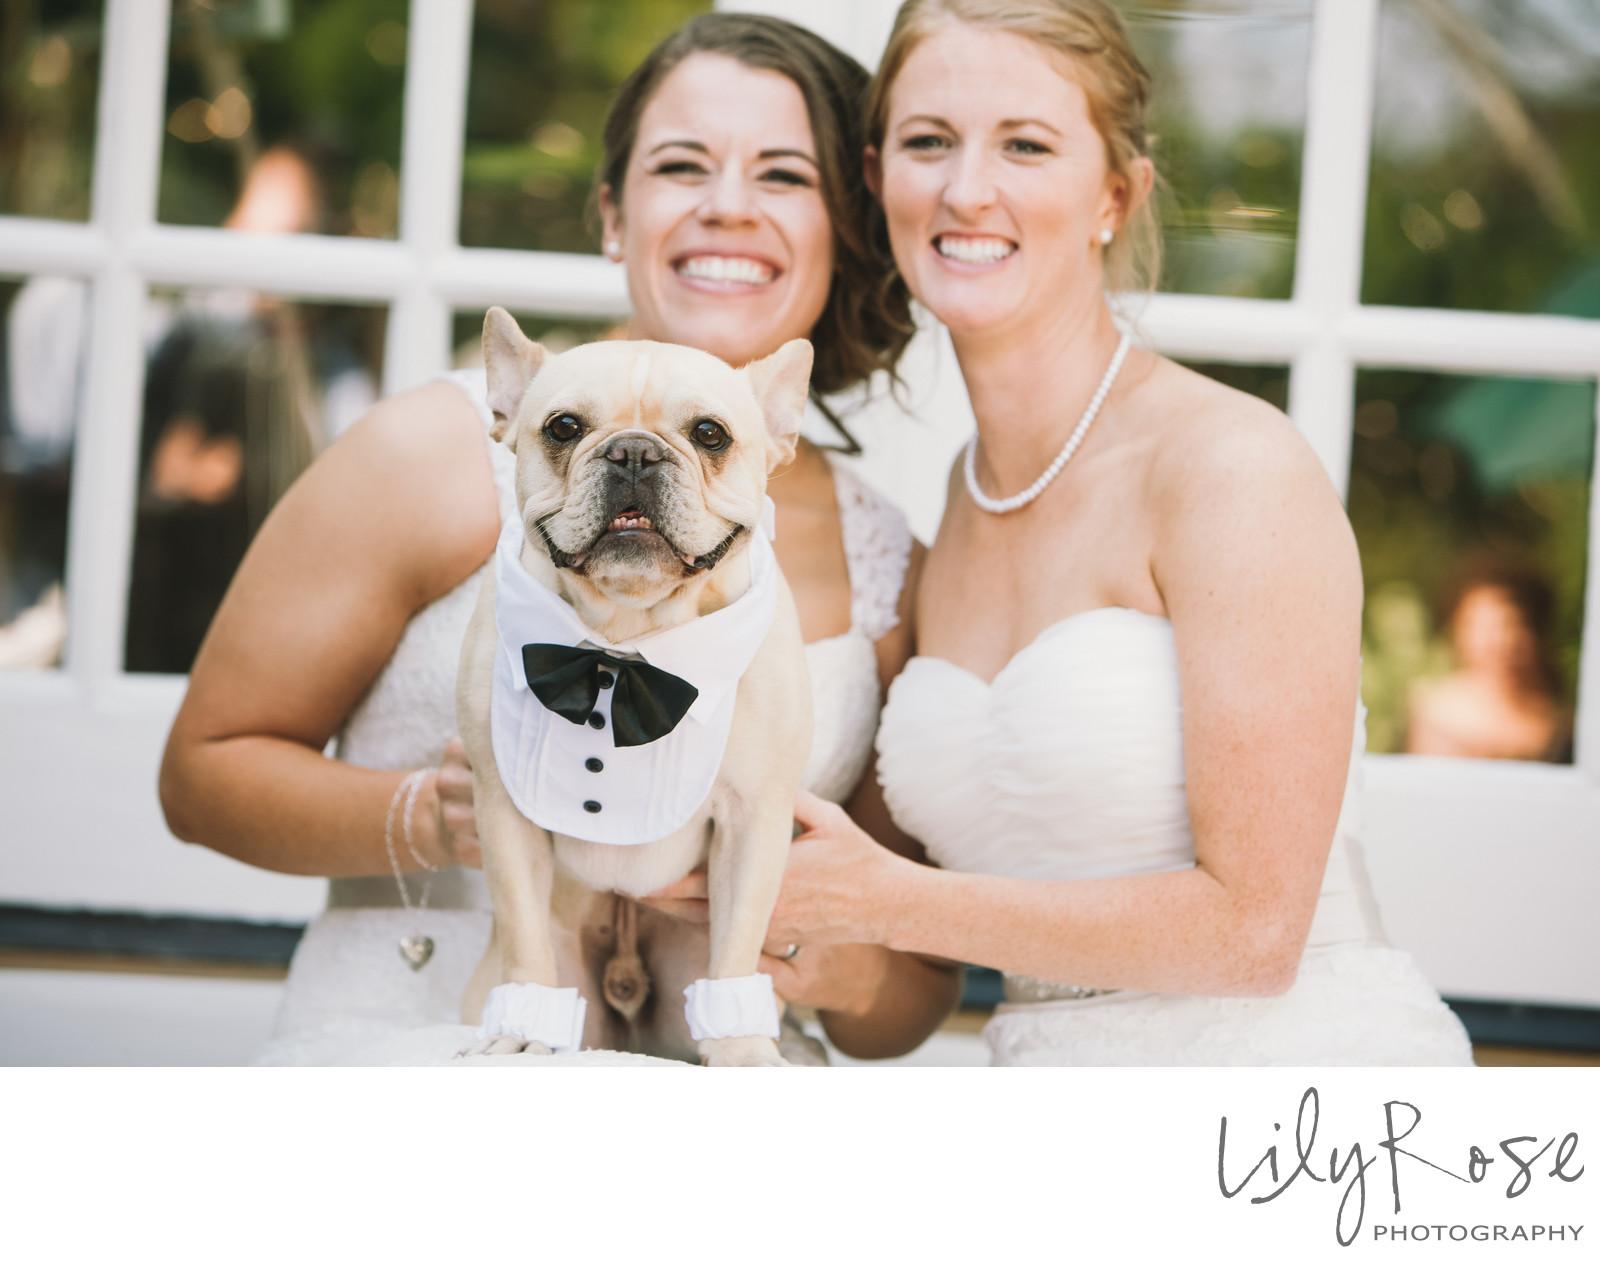 Wedding Sex Pictures